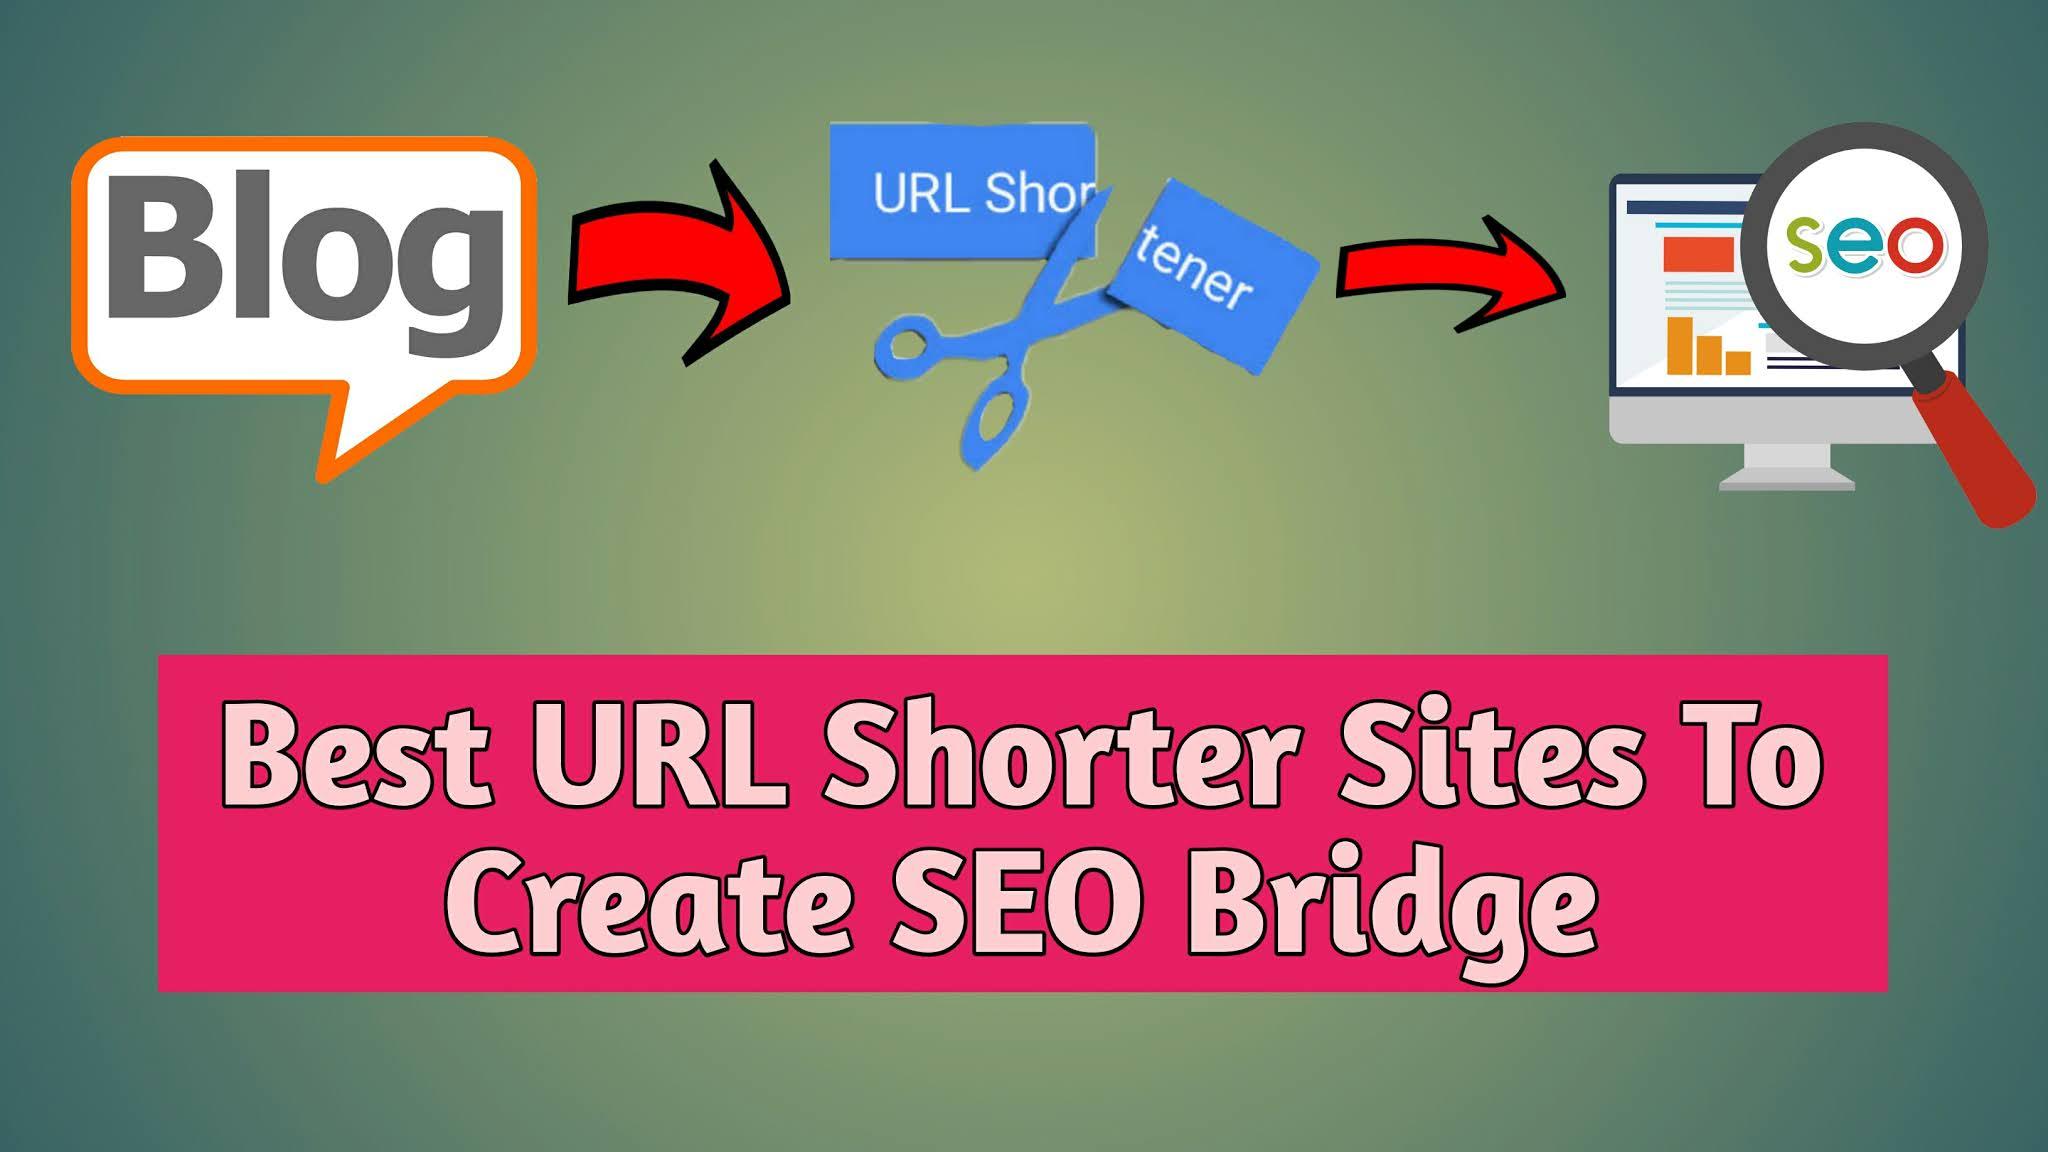 Best URL Shorter Sites To Create SEO Bridge